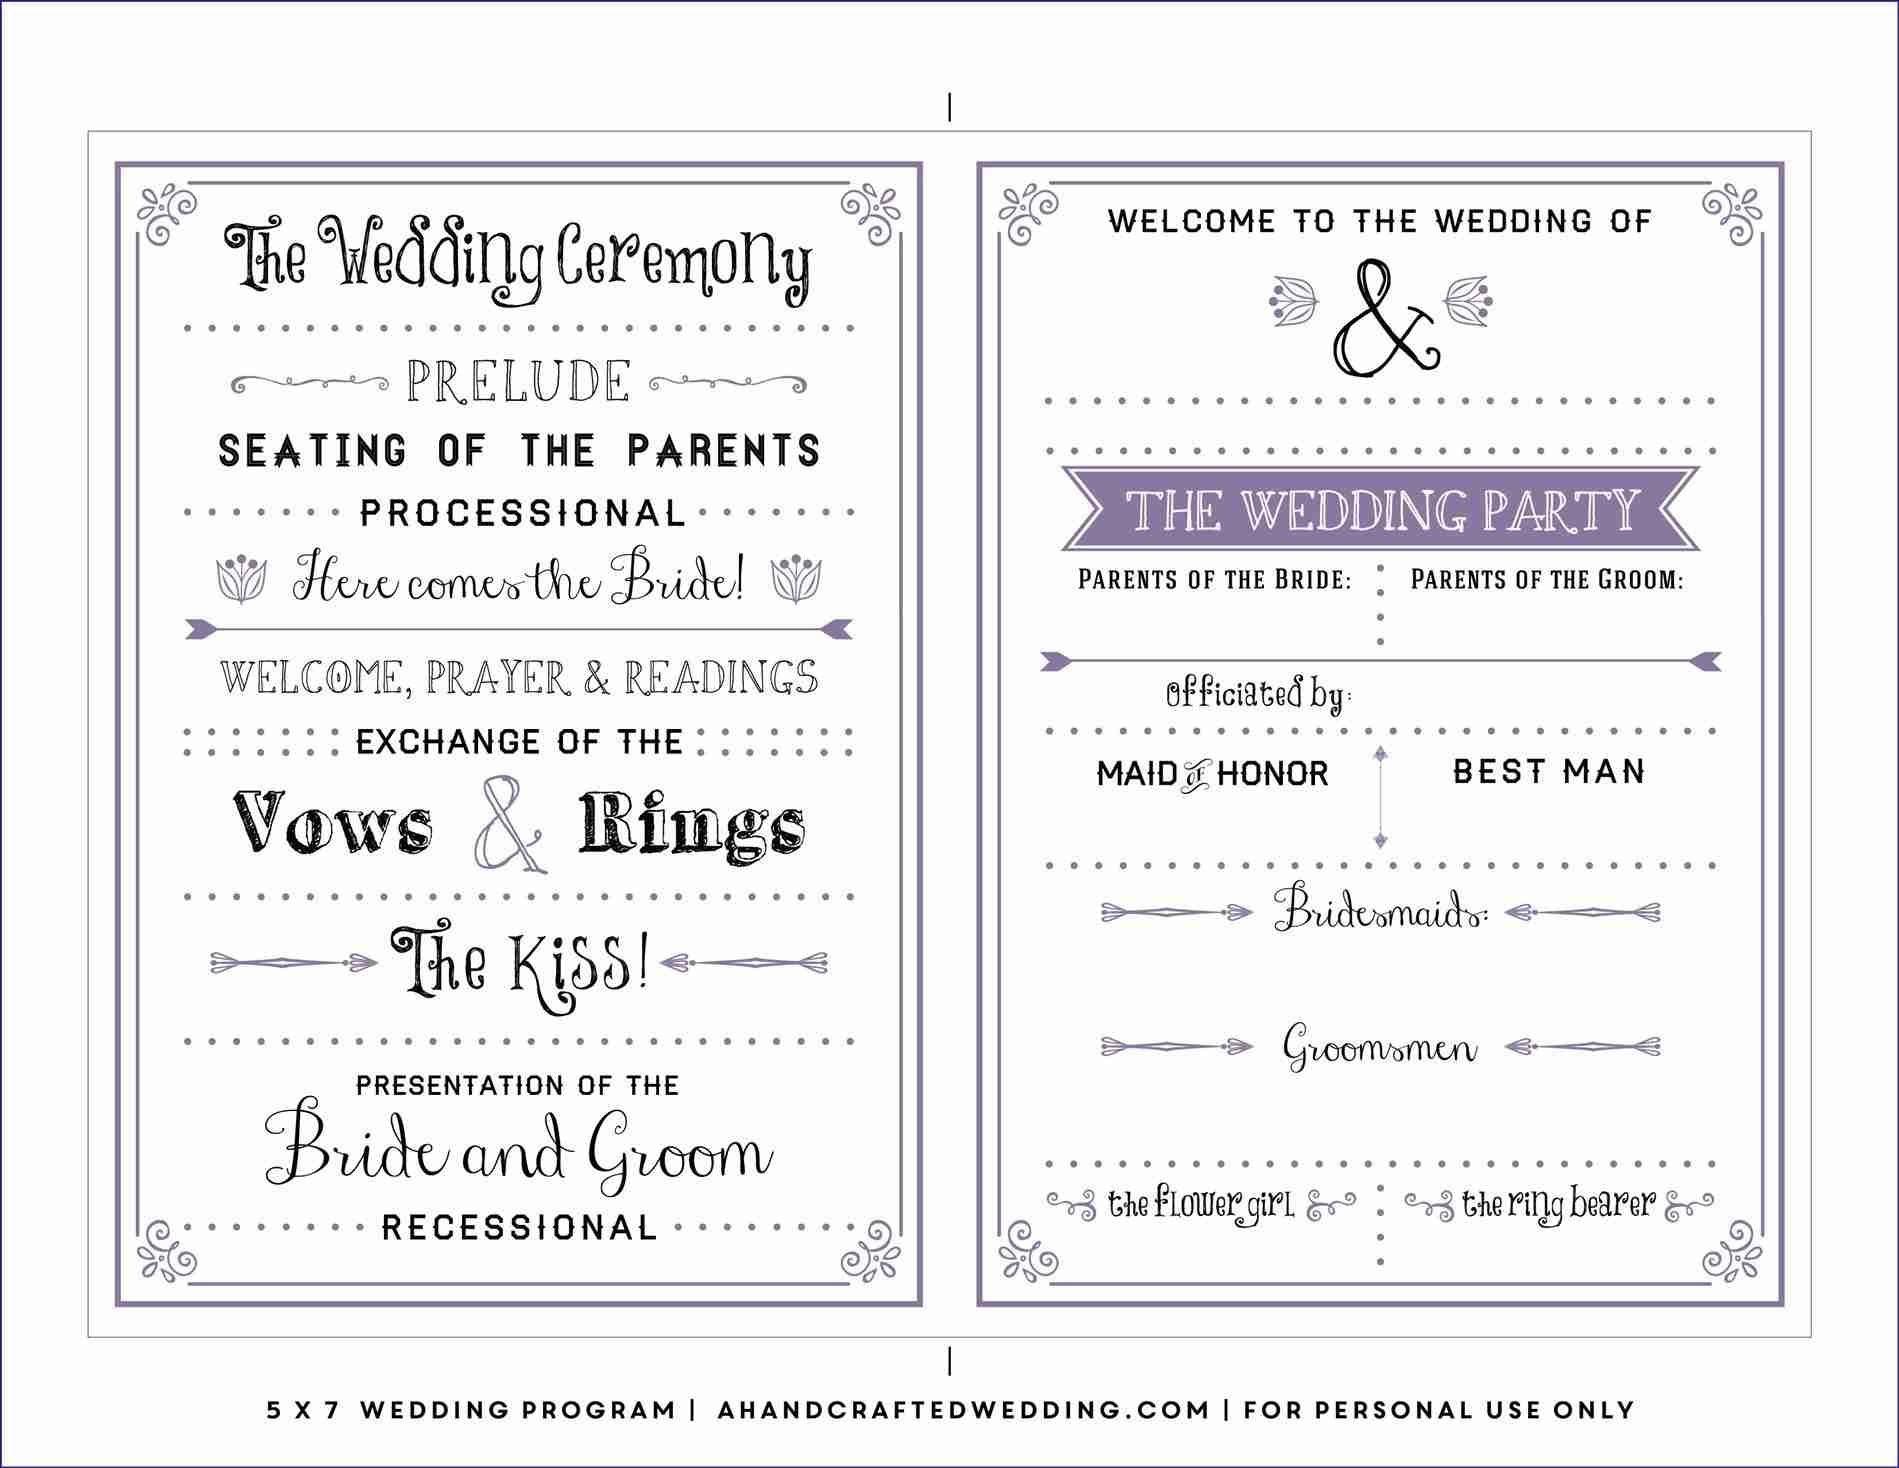 Free Downloadable Wedding Program Template That Can Be Printed - Free Printable Fan Wedding Programs